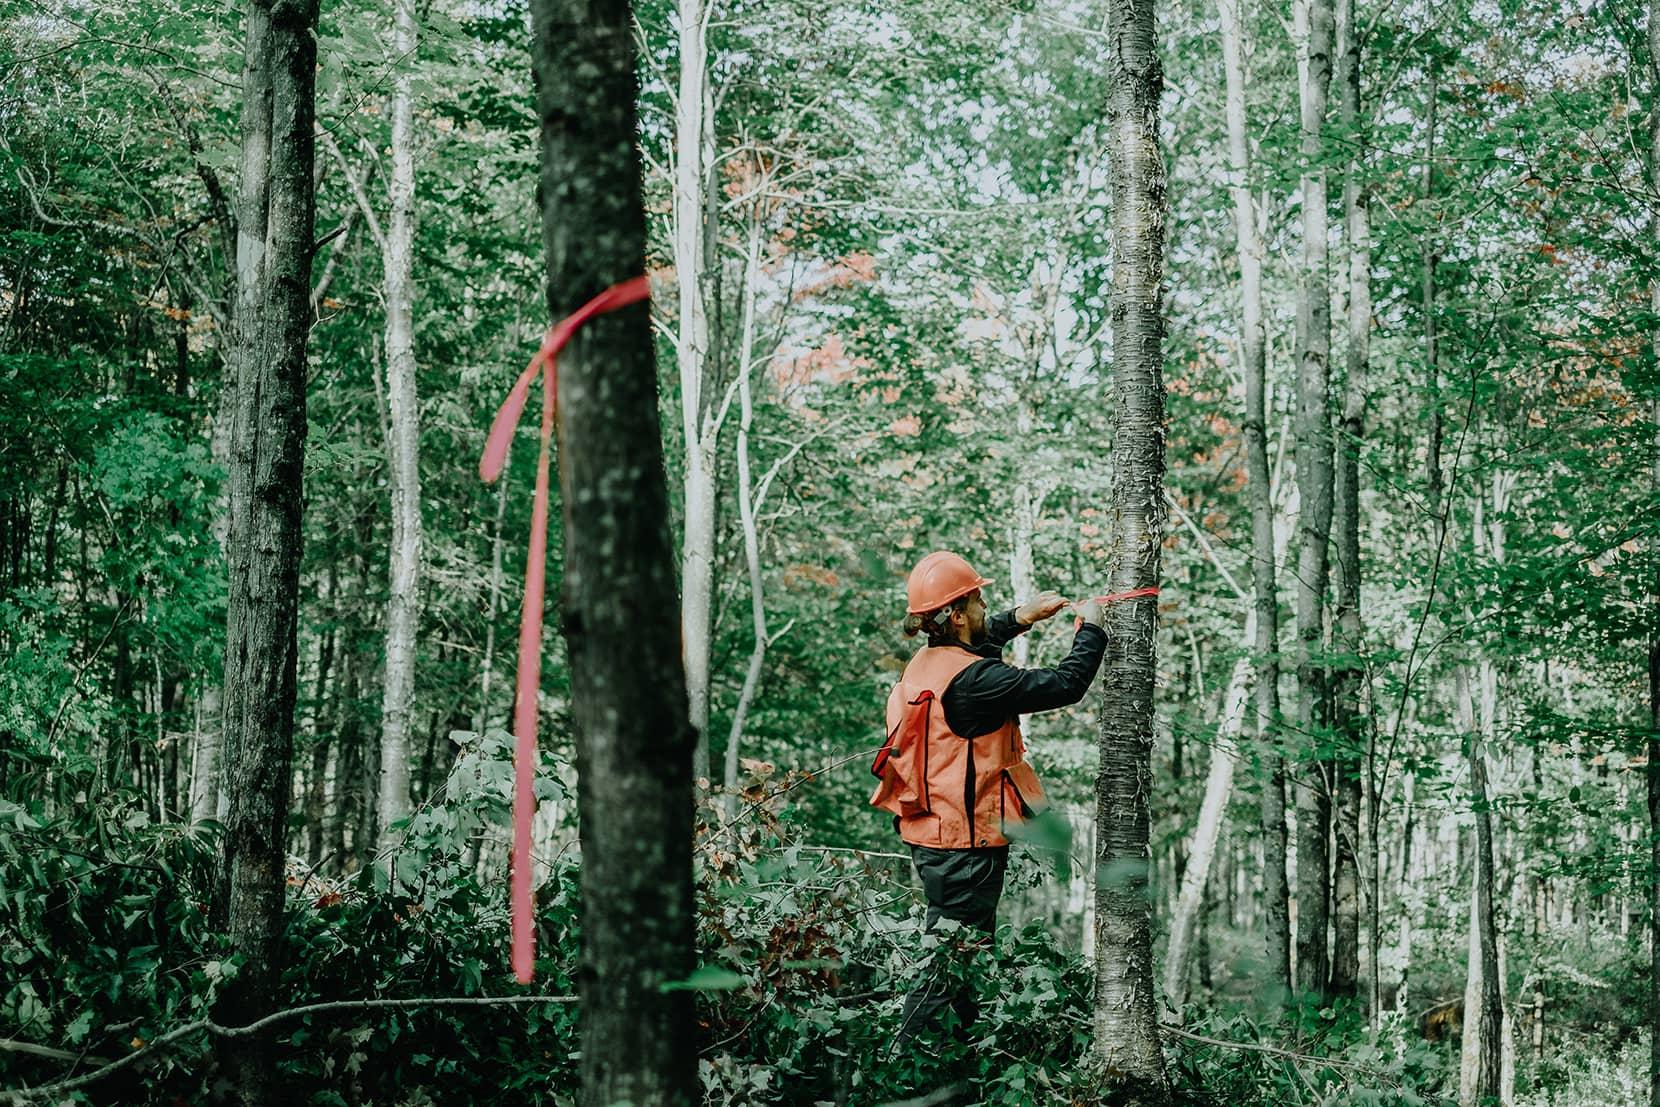 Laforêt - Marquage des arbres (martelage) et identification